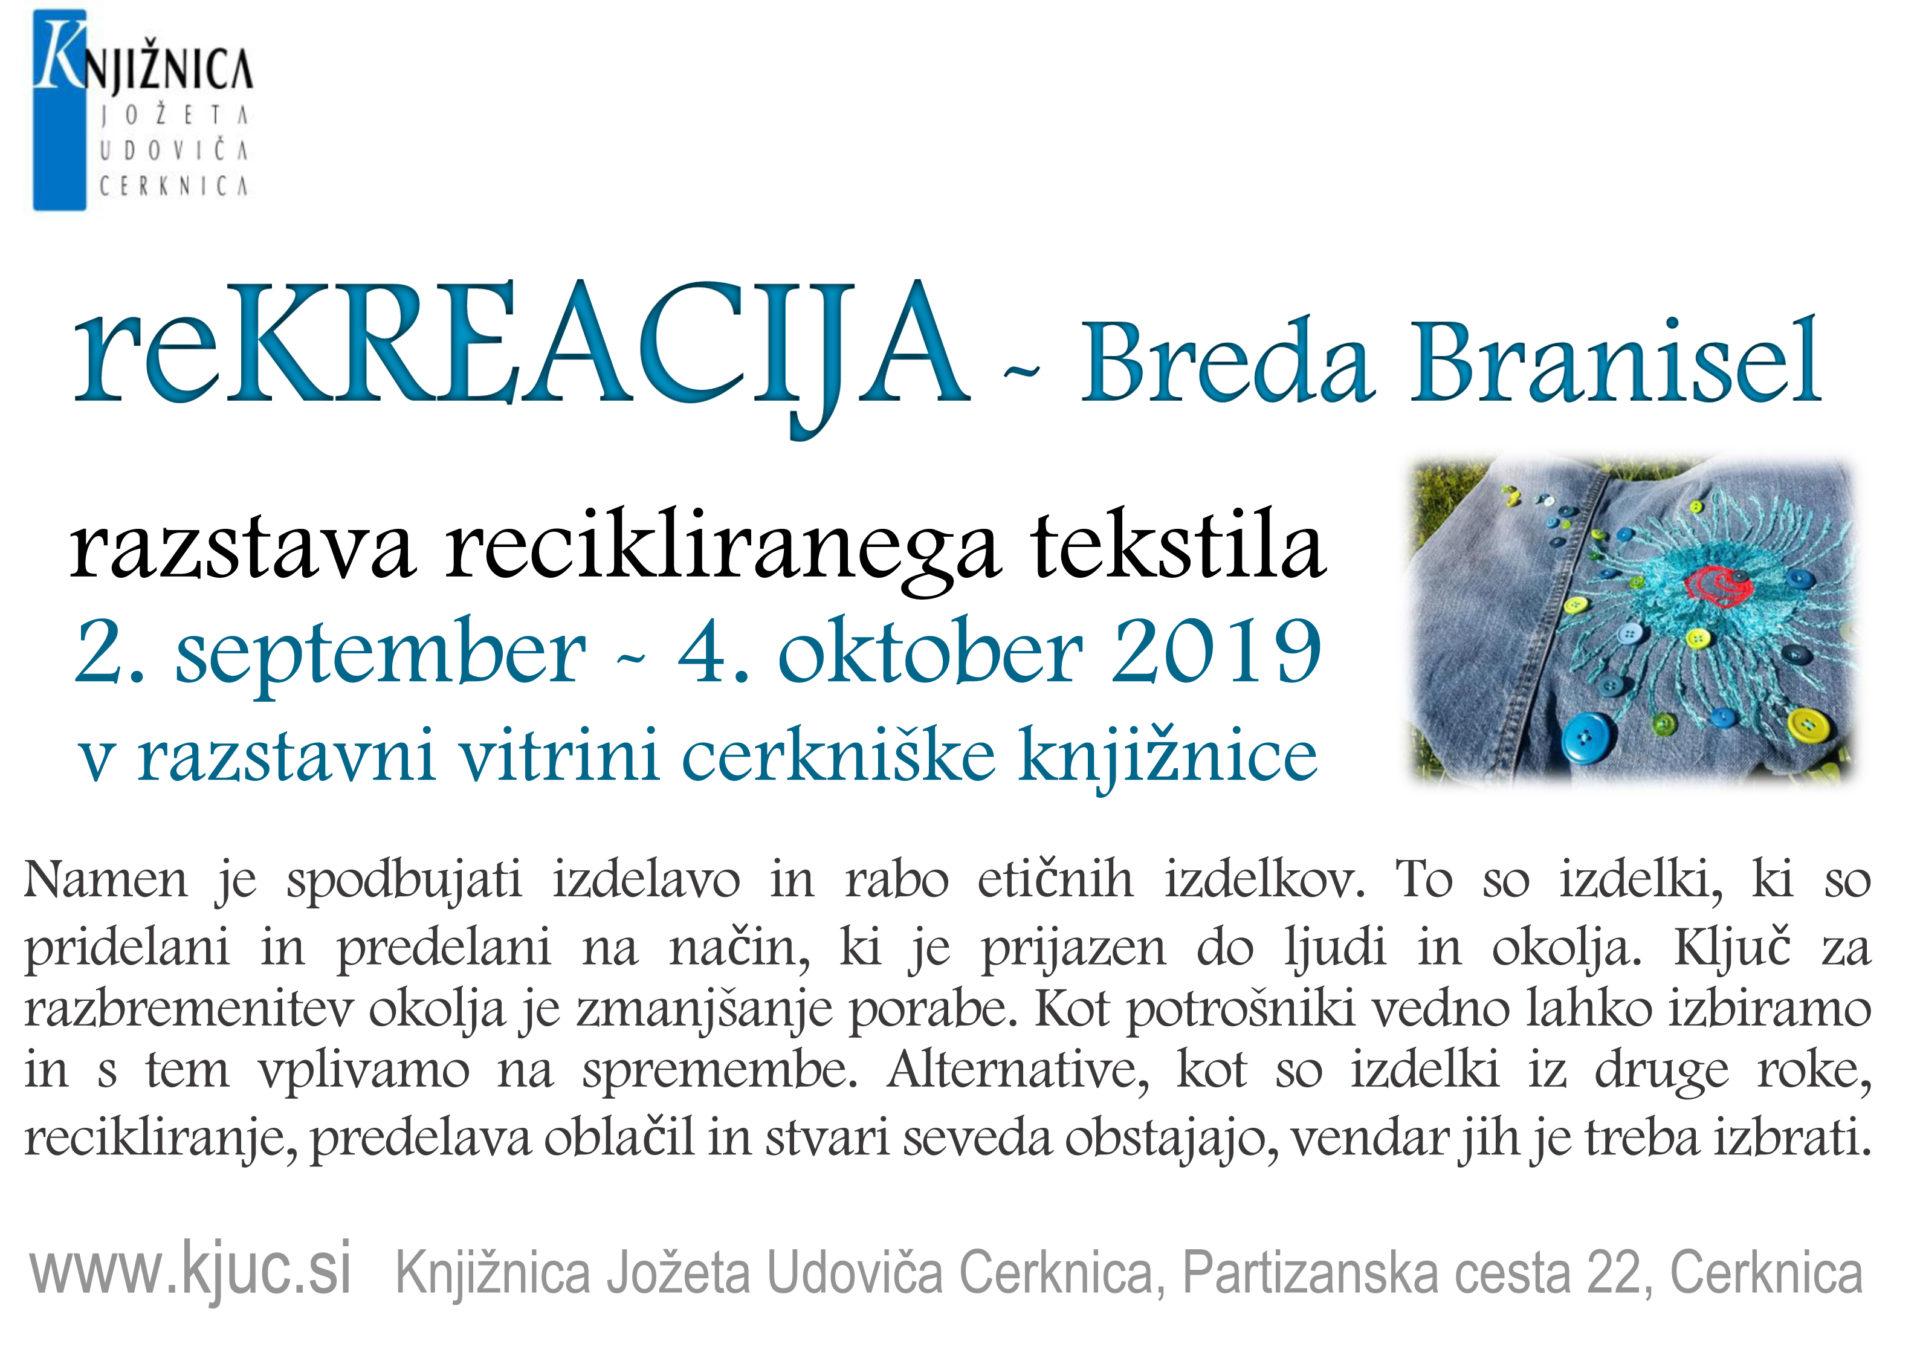 reKREACIJA vabilo - reKREACIJA - Breda Branisel - razstava recikliranega tekstila